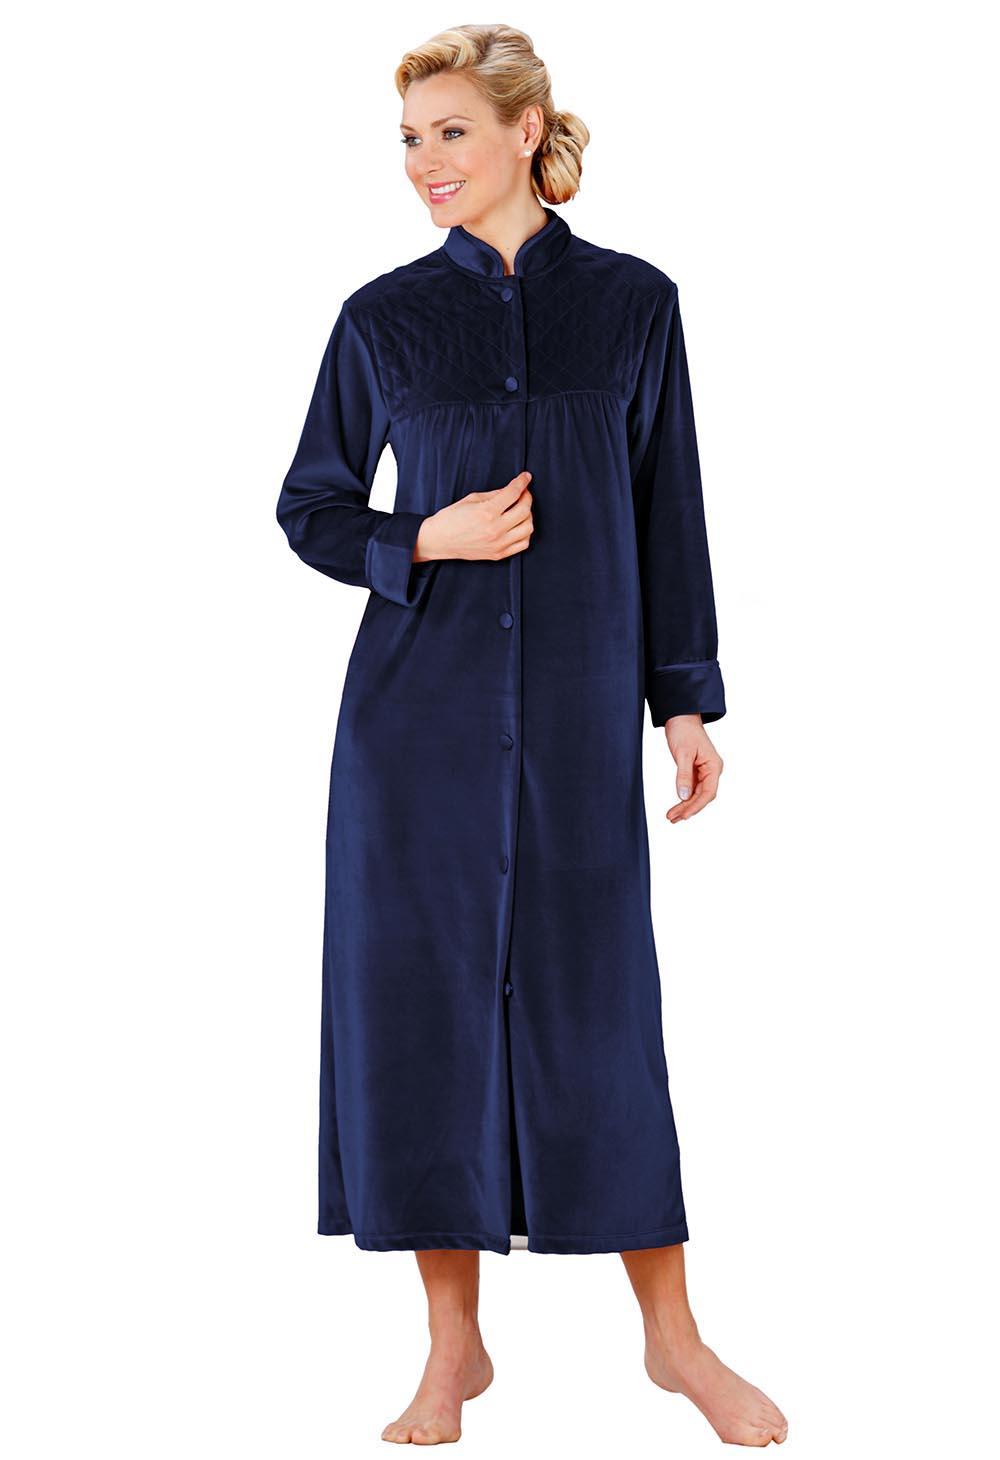 Robe De Chambre En Velours Bleu Bonheur